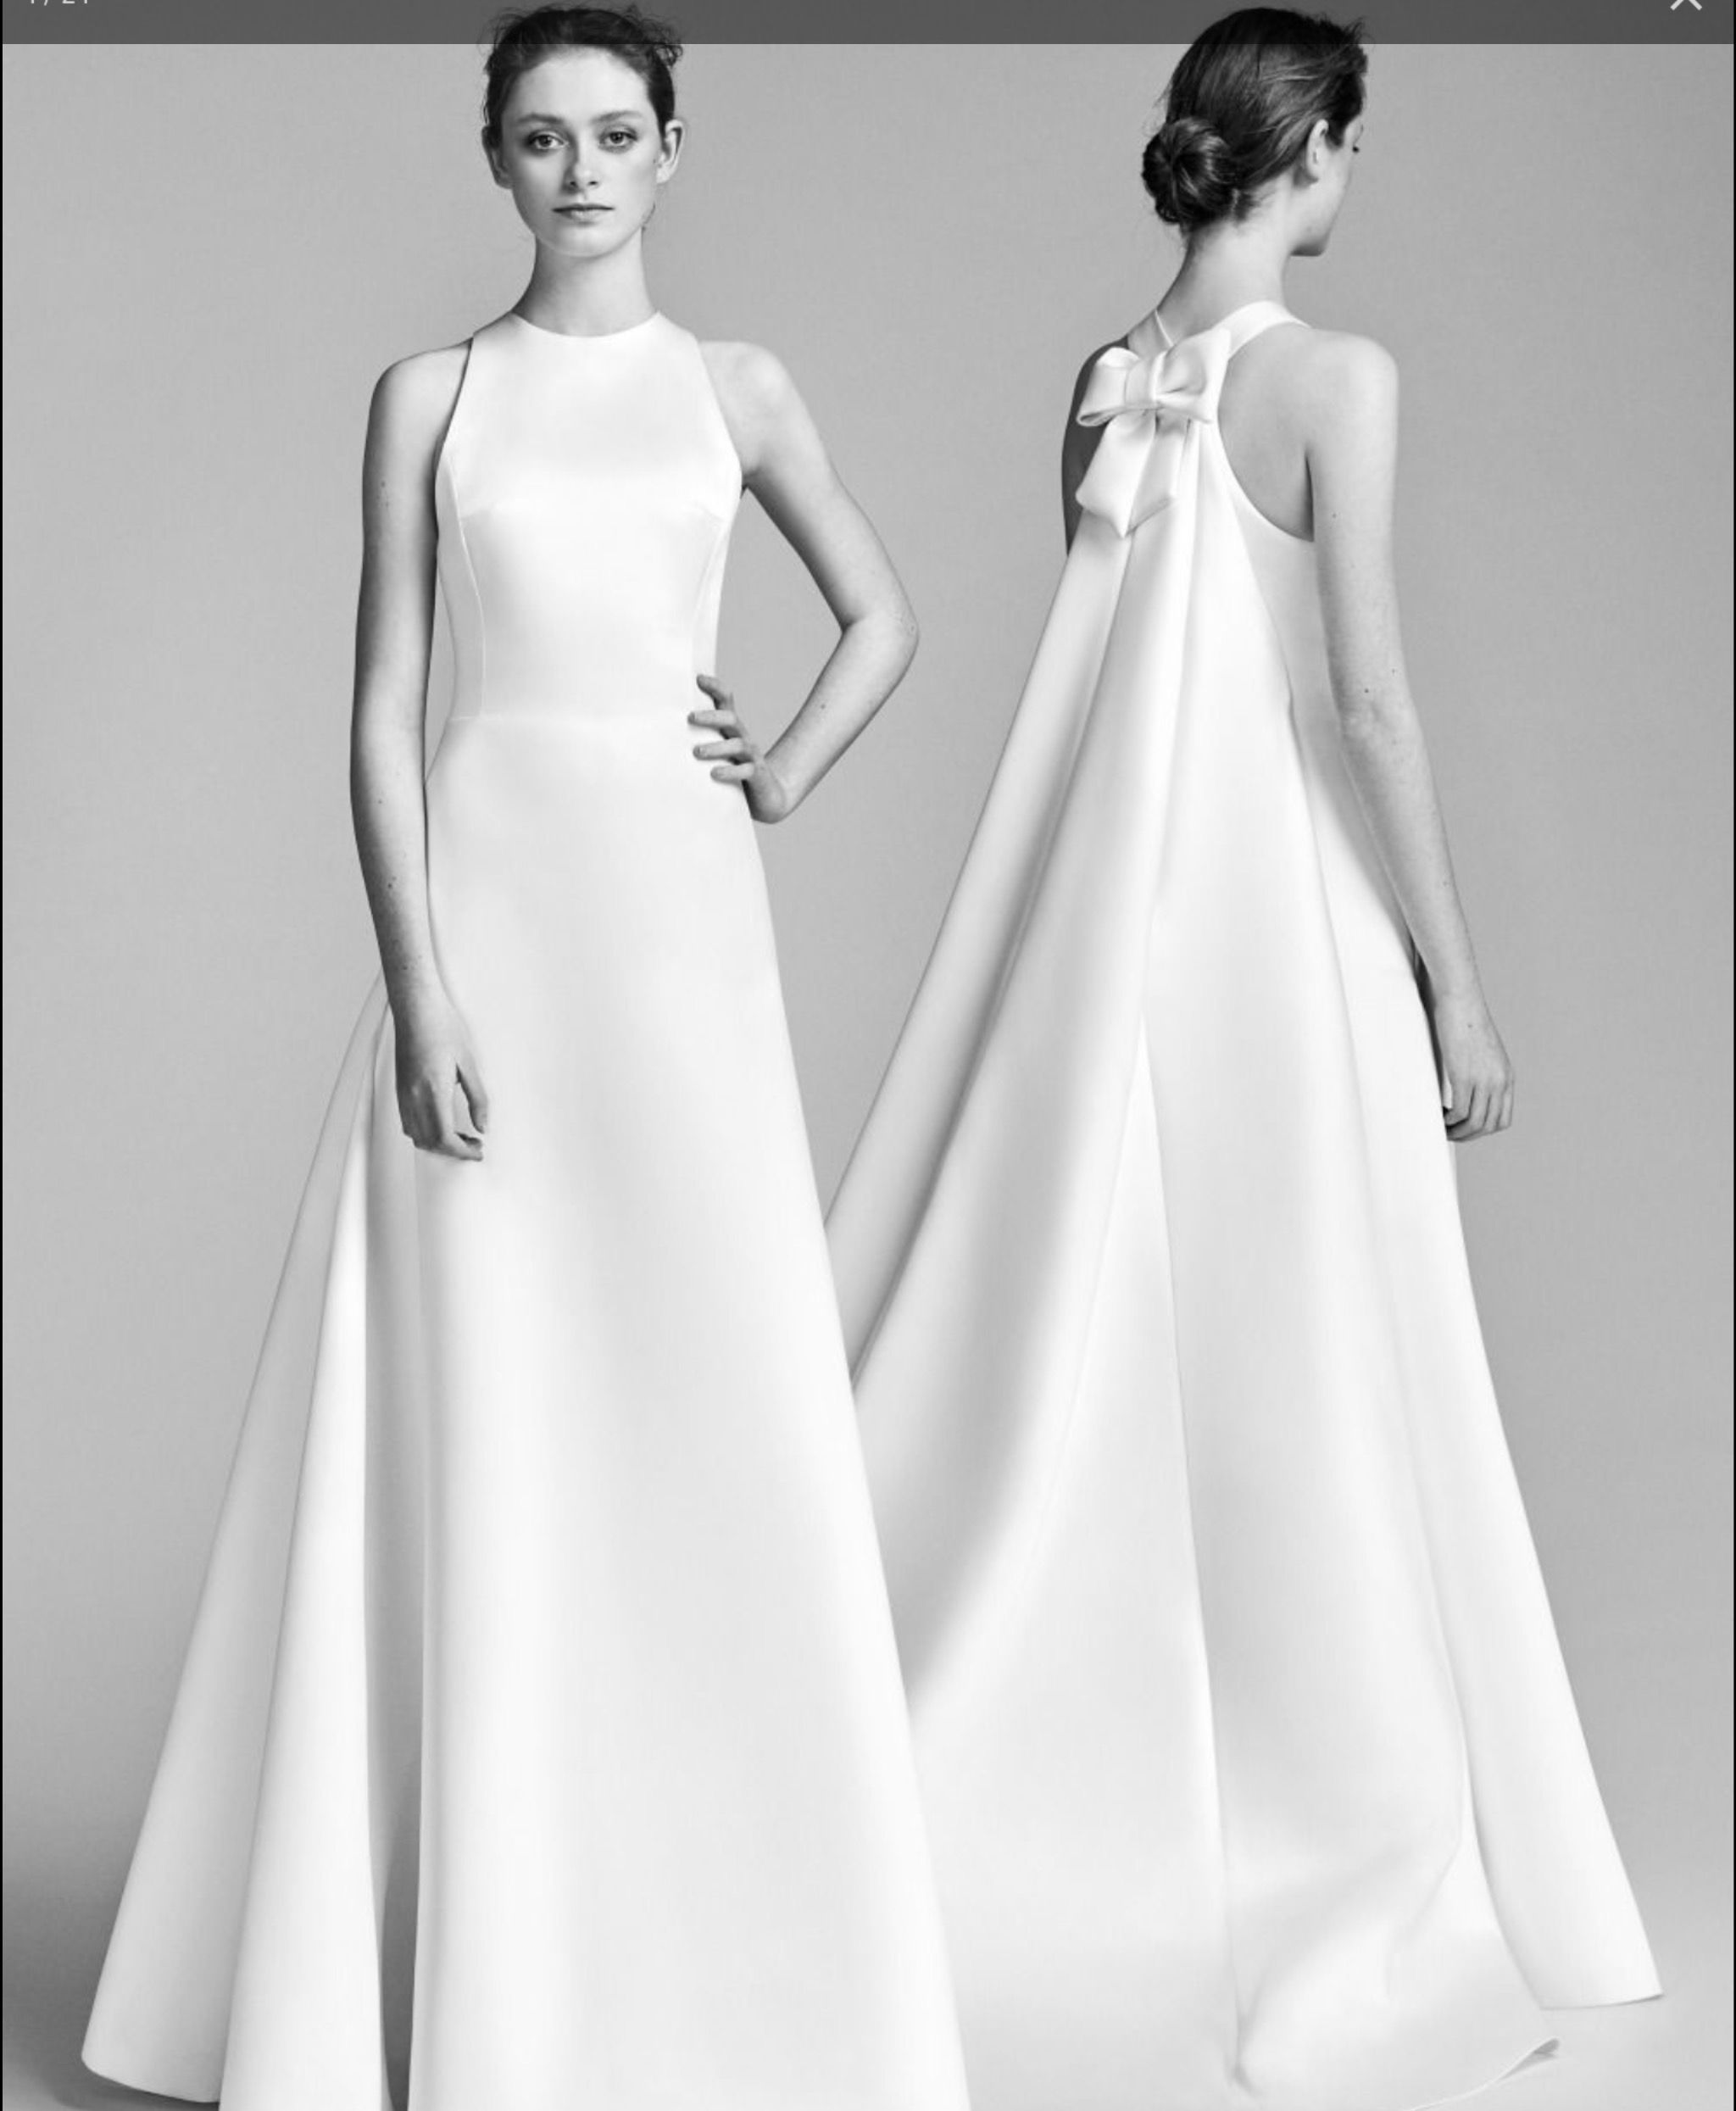 Victor en rolf bridesmaids pinterest wedding dresses wedding